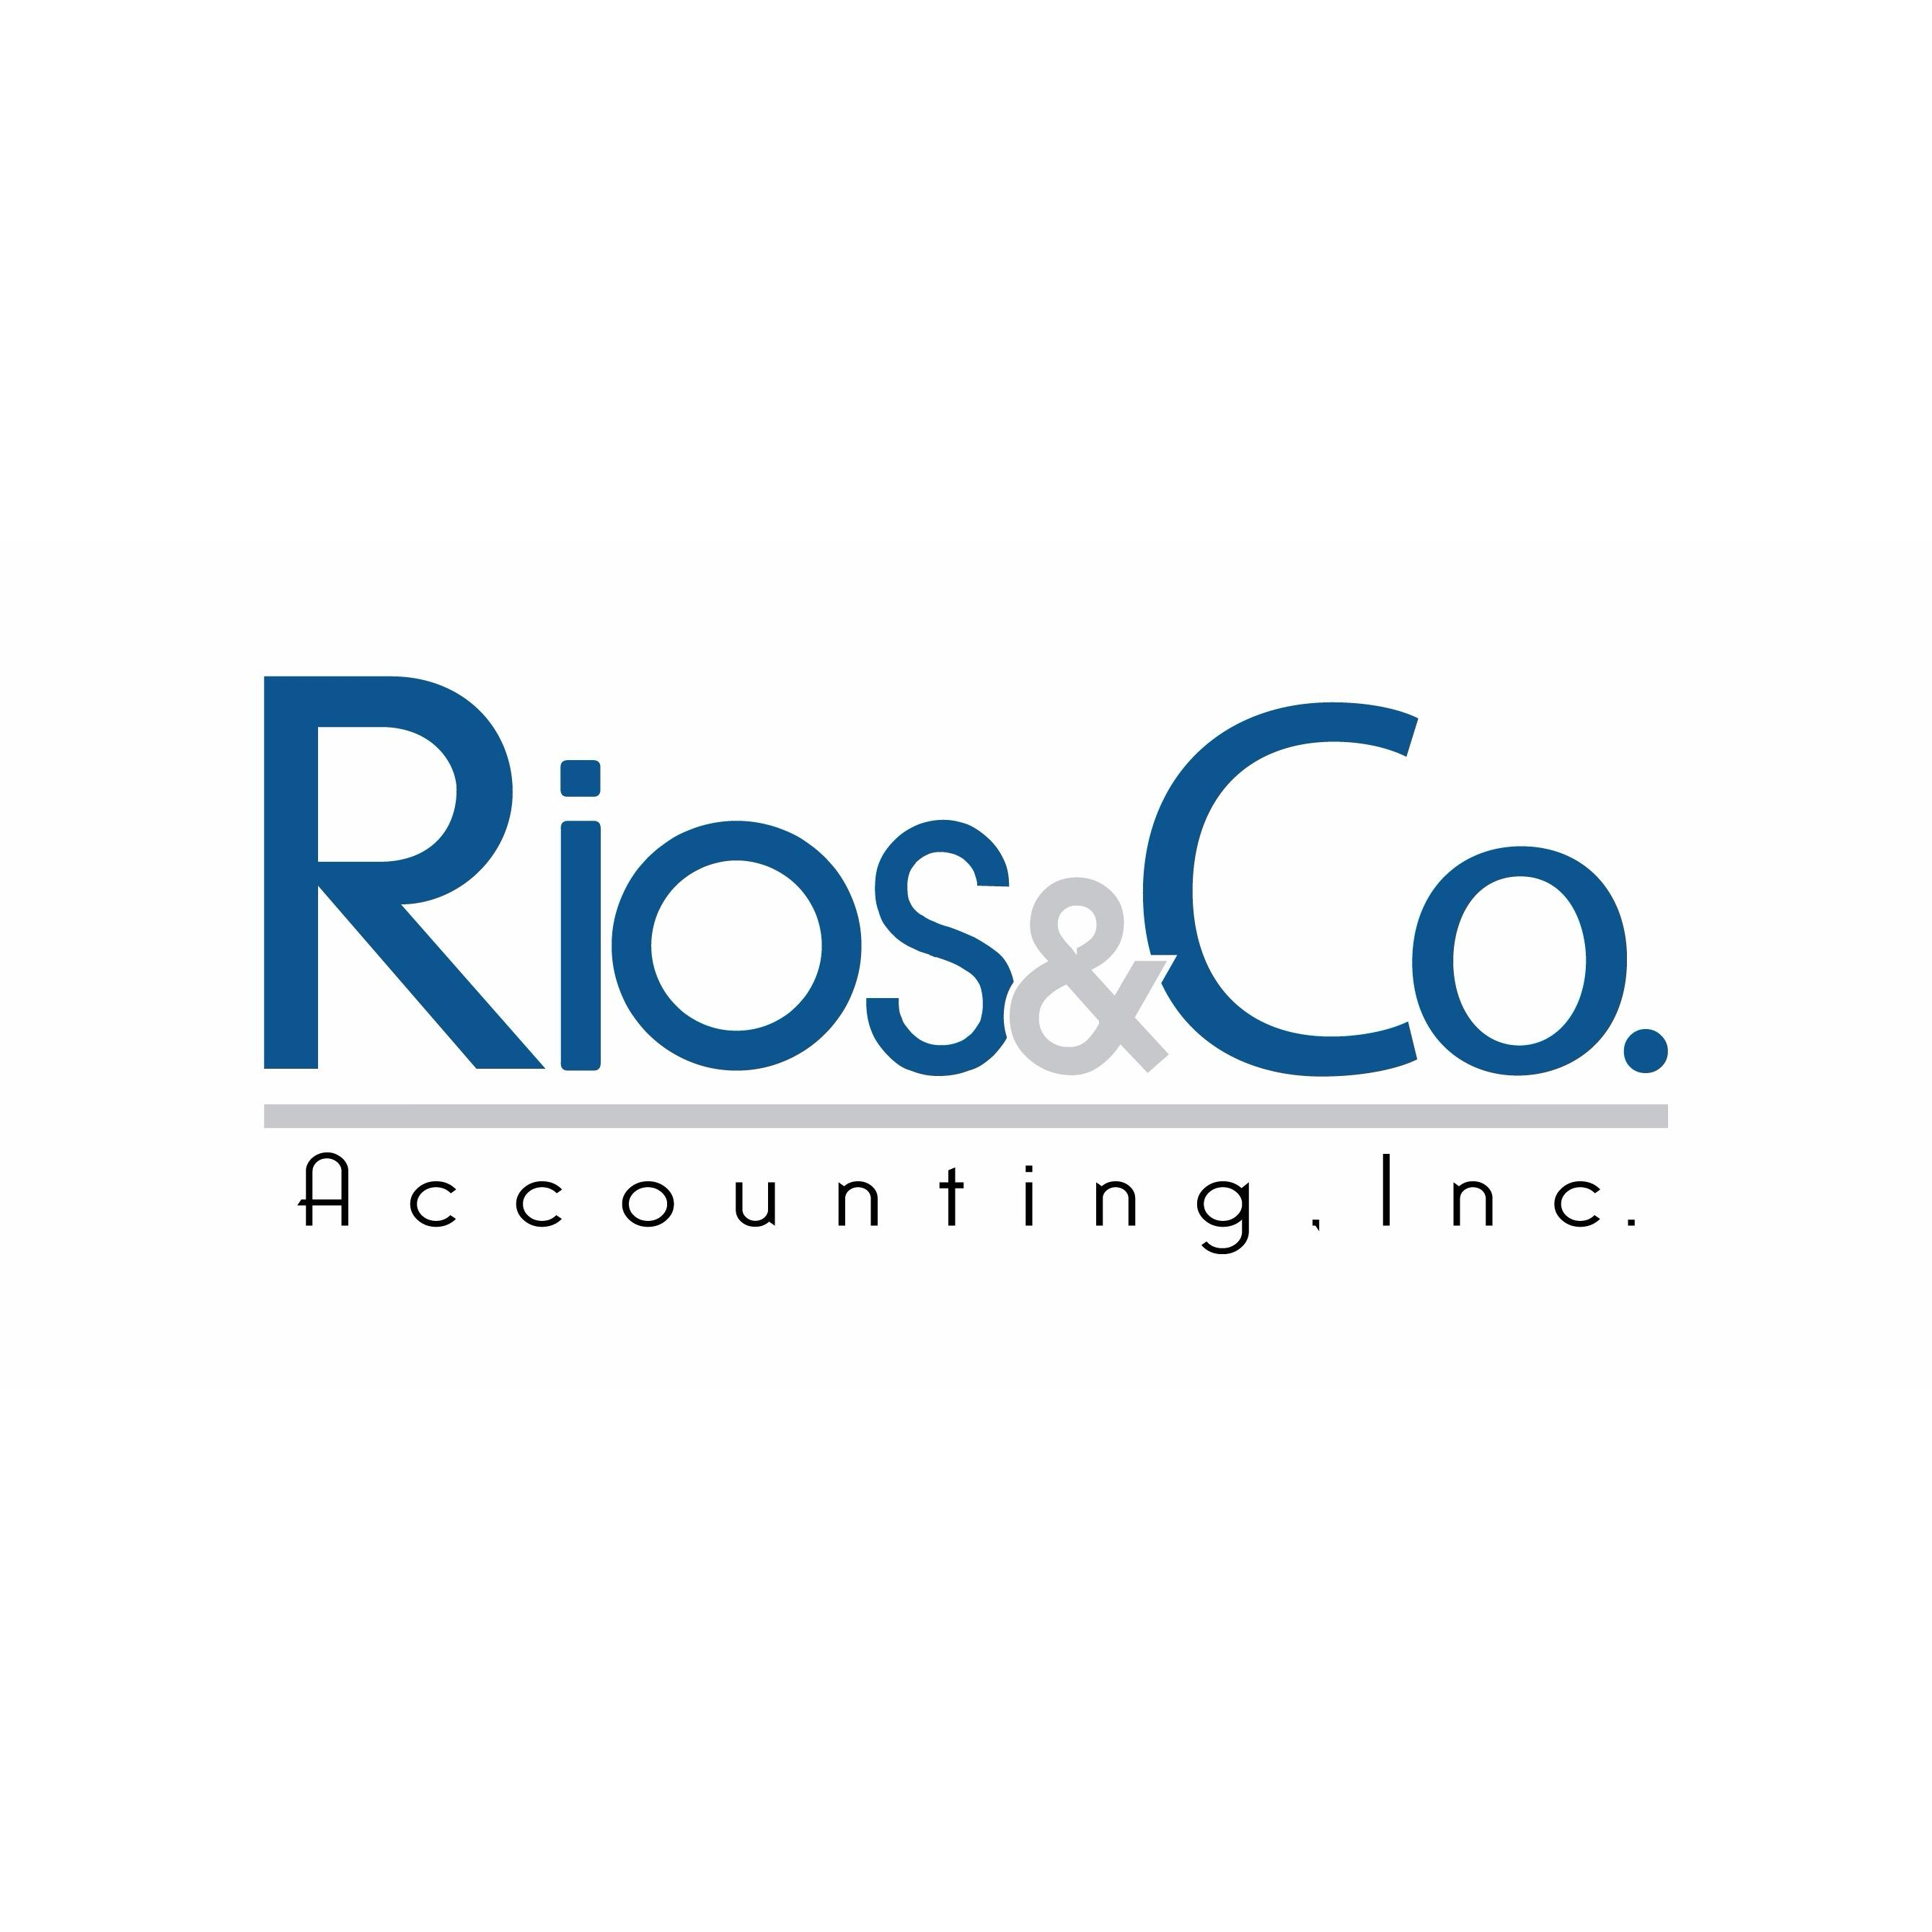 Rios & Co Accounting Inc